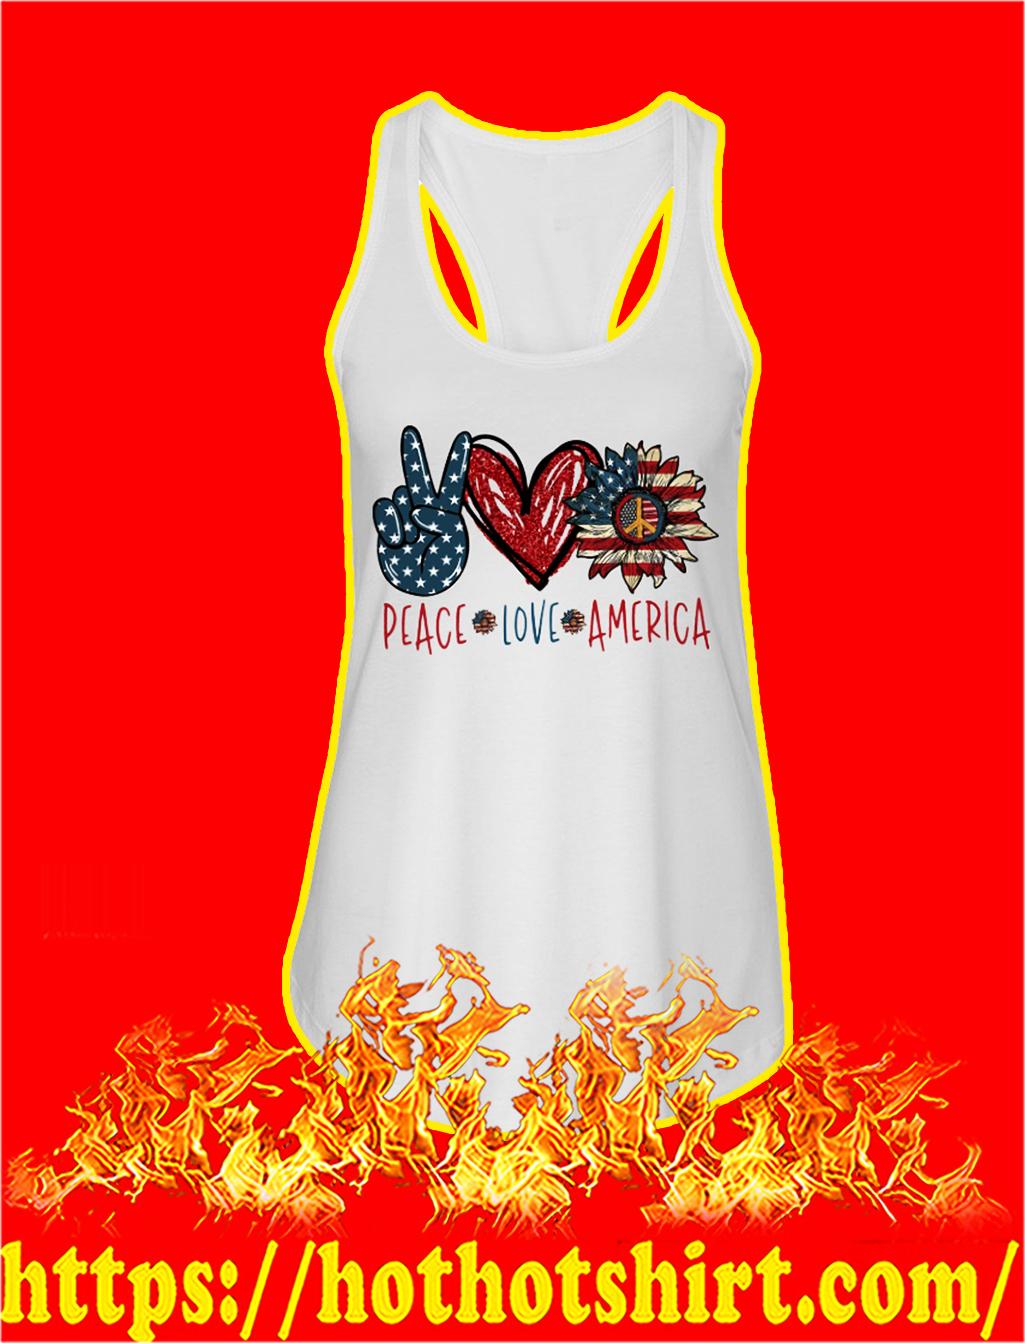 Peace love america american flag tank top